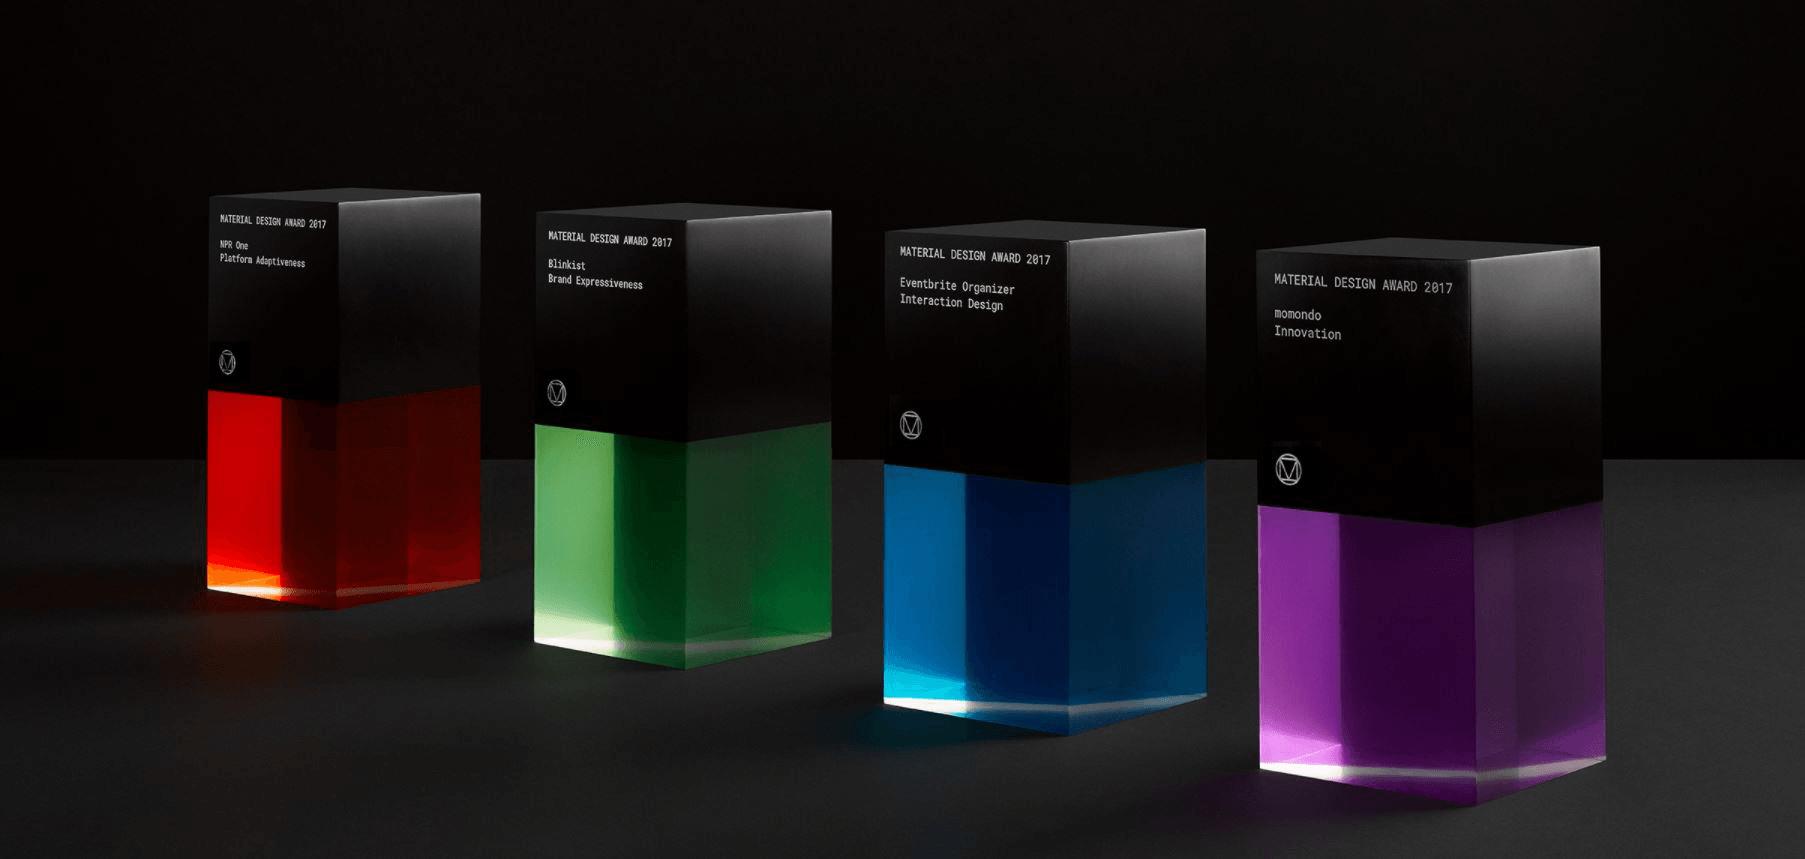 Google Design's Material Design Awards 2017